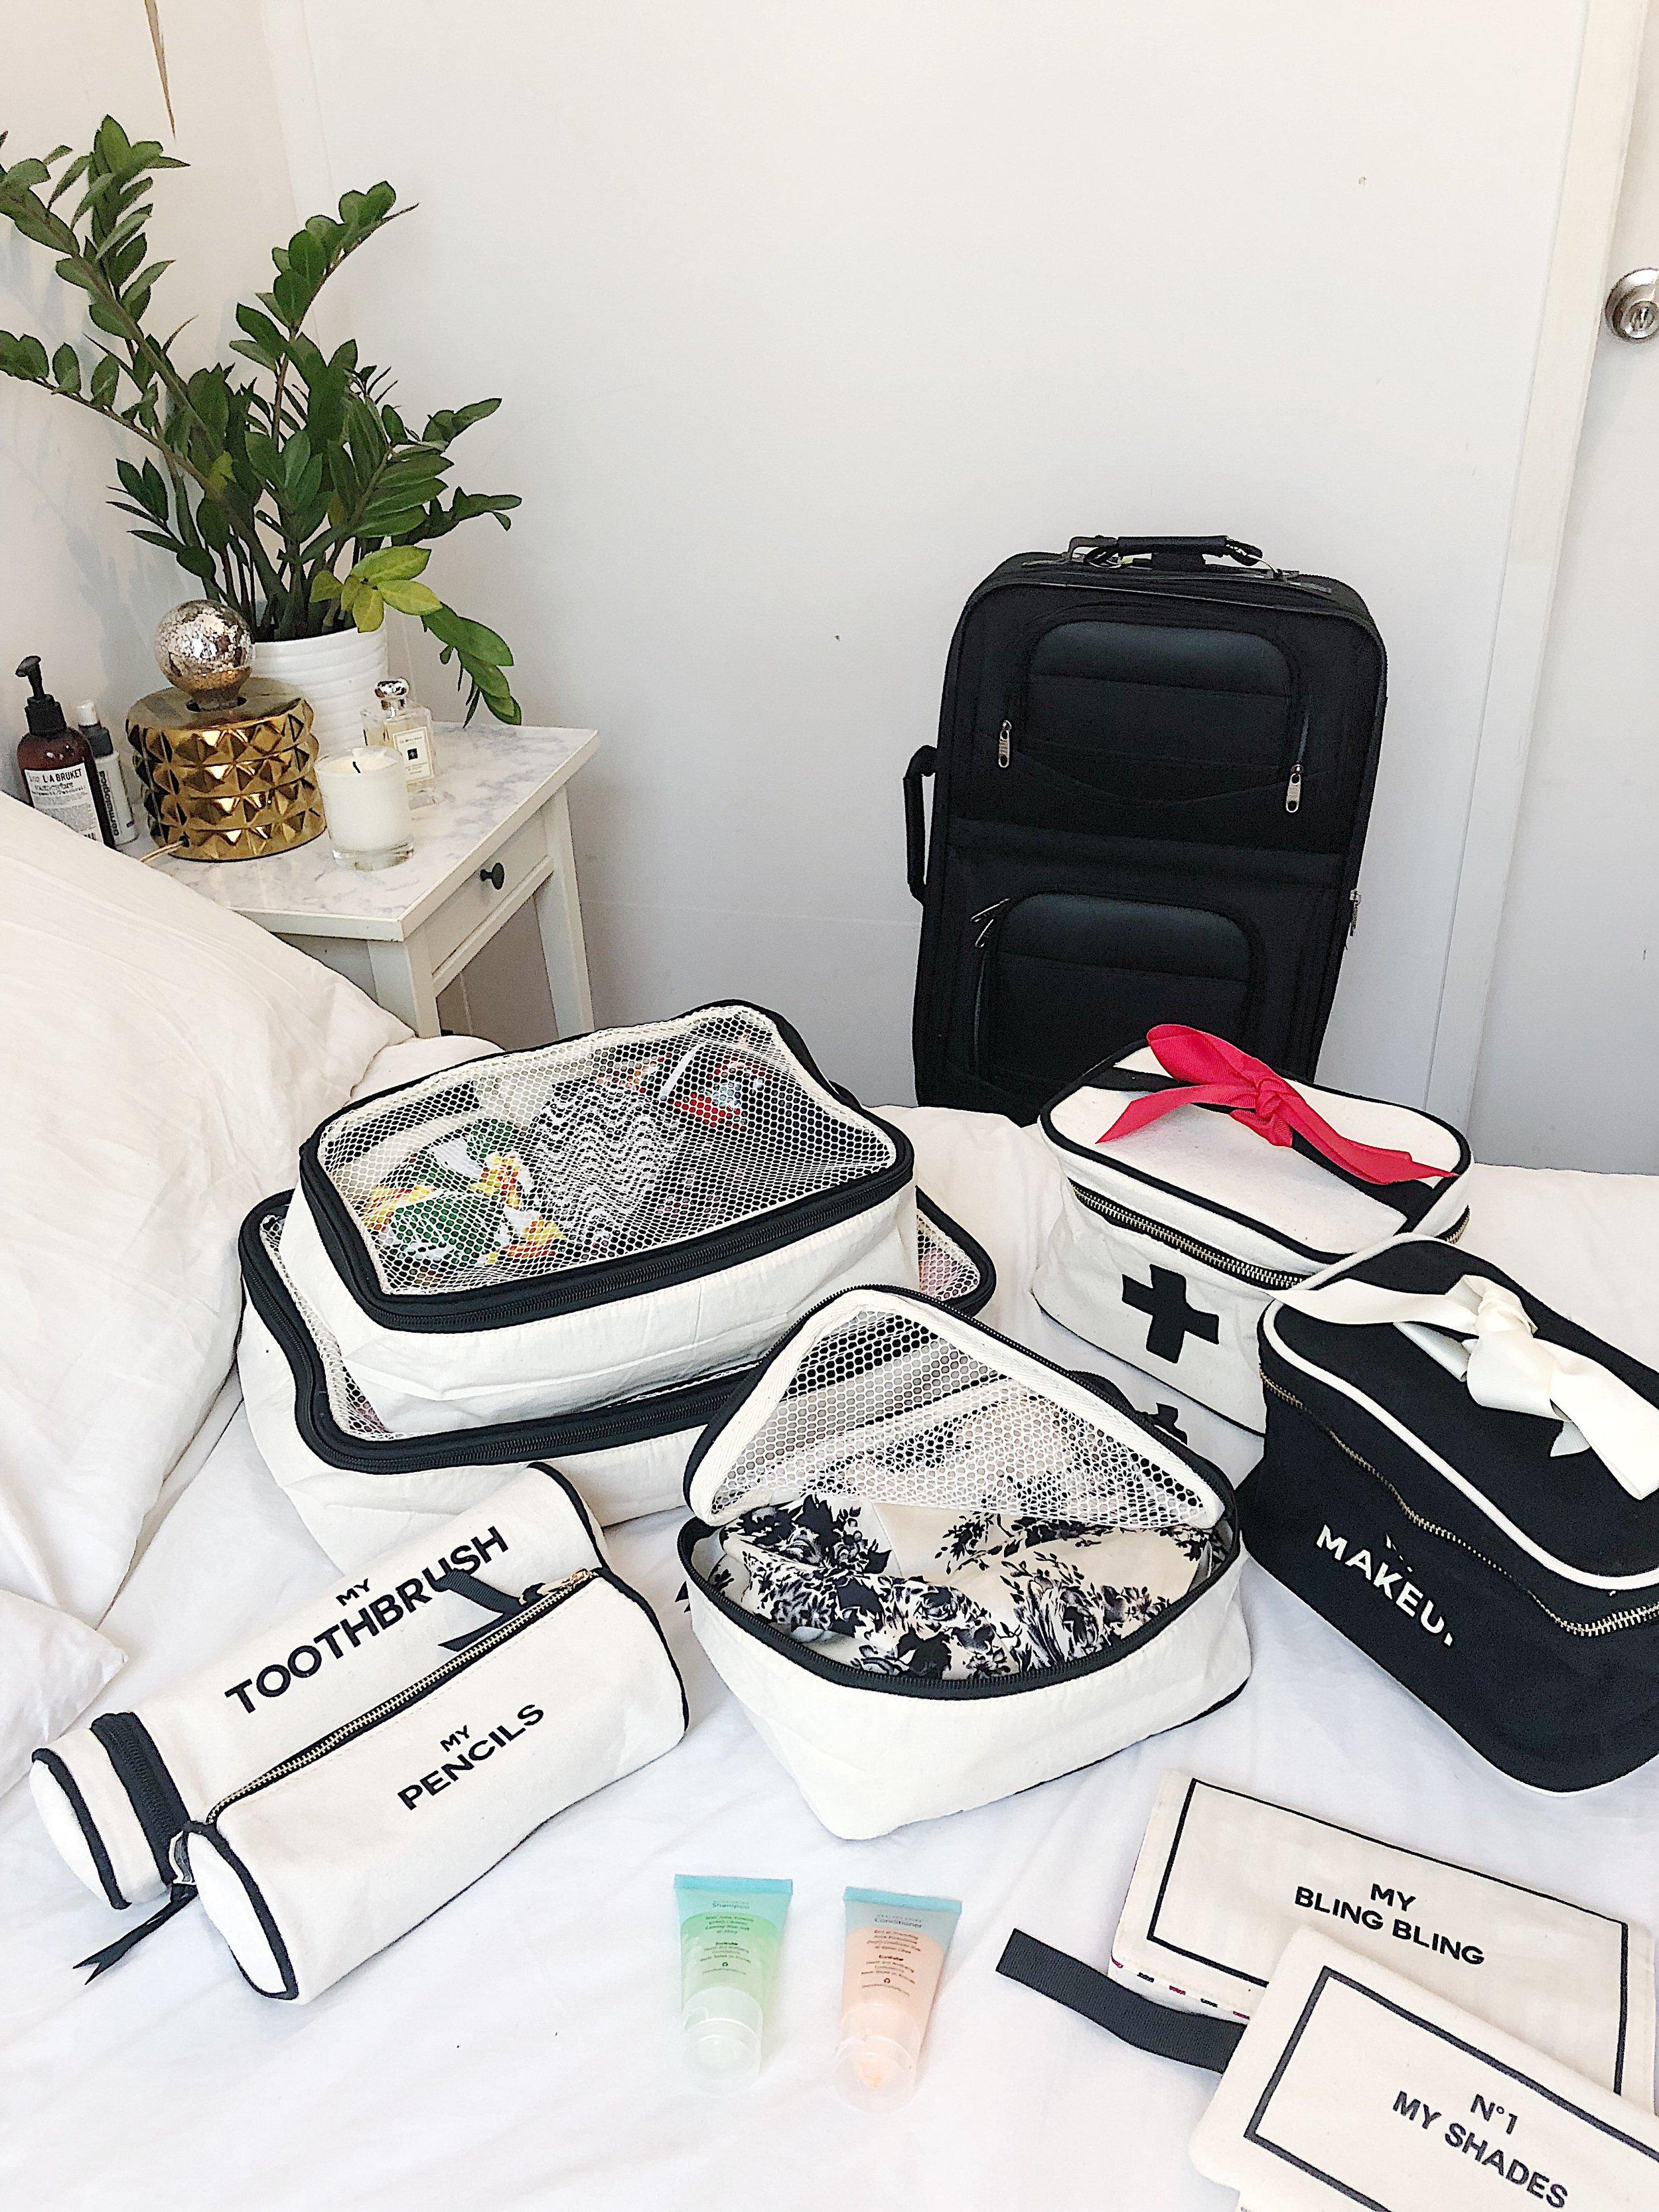 my toothbrush , black beauty box, blank packing cubes, my pencils, my bling bling, my shades, medical box cross mood Bag-all.jpeg